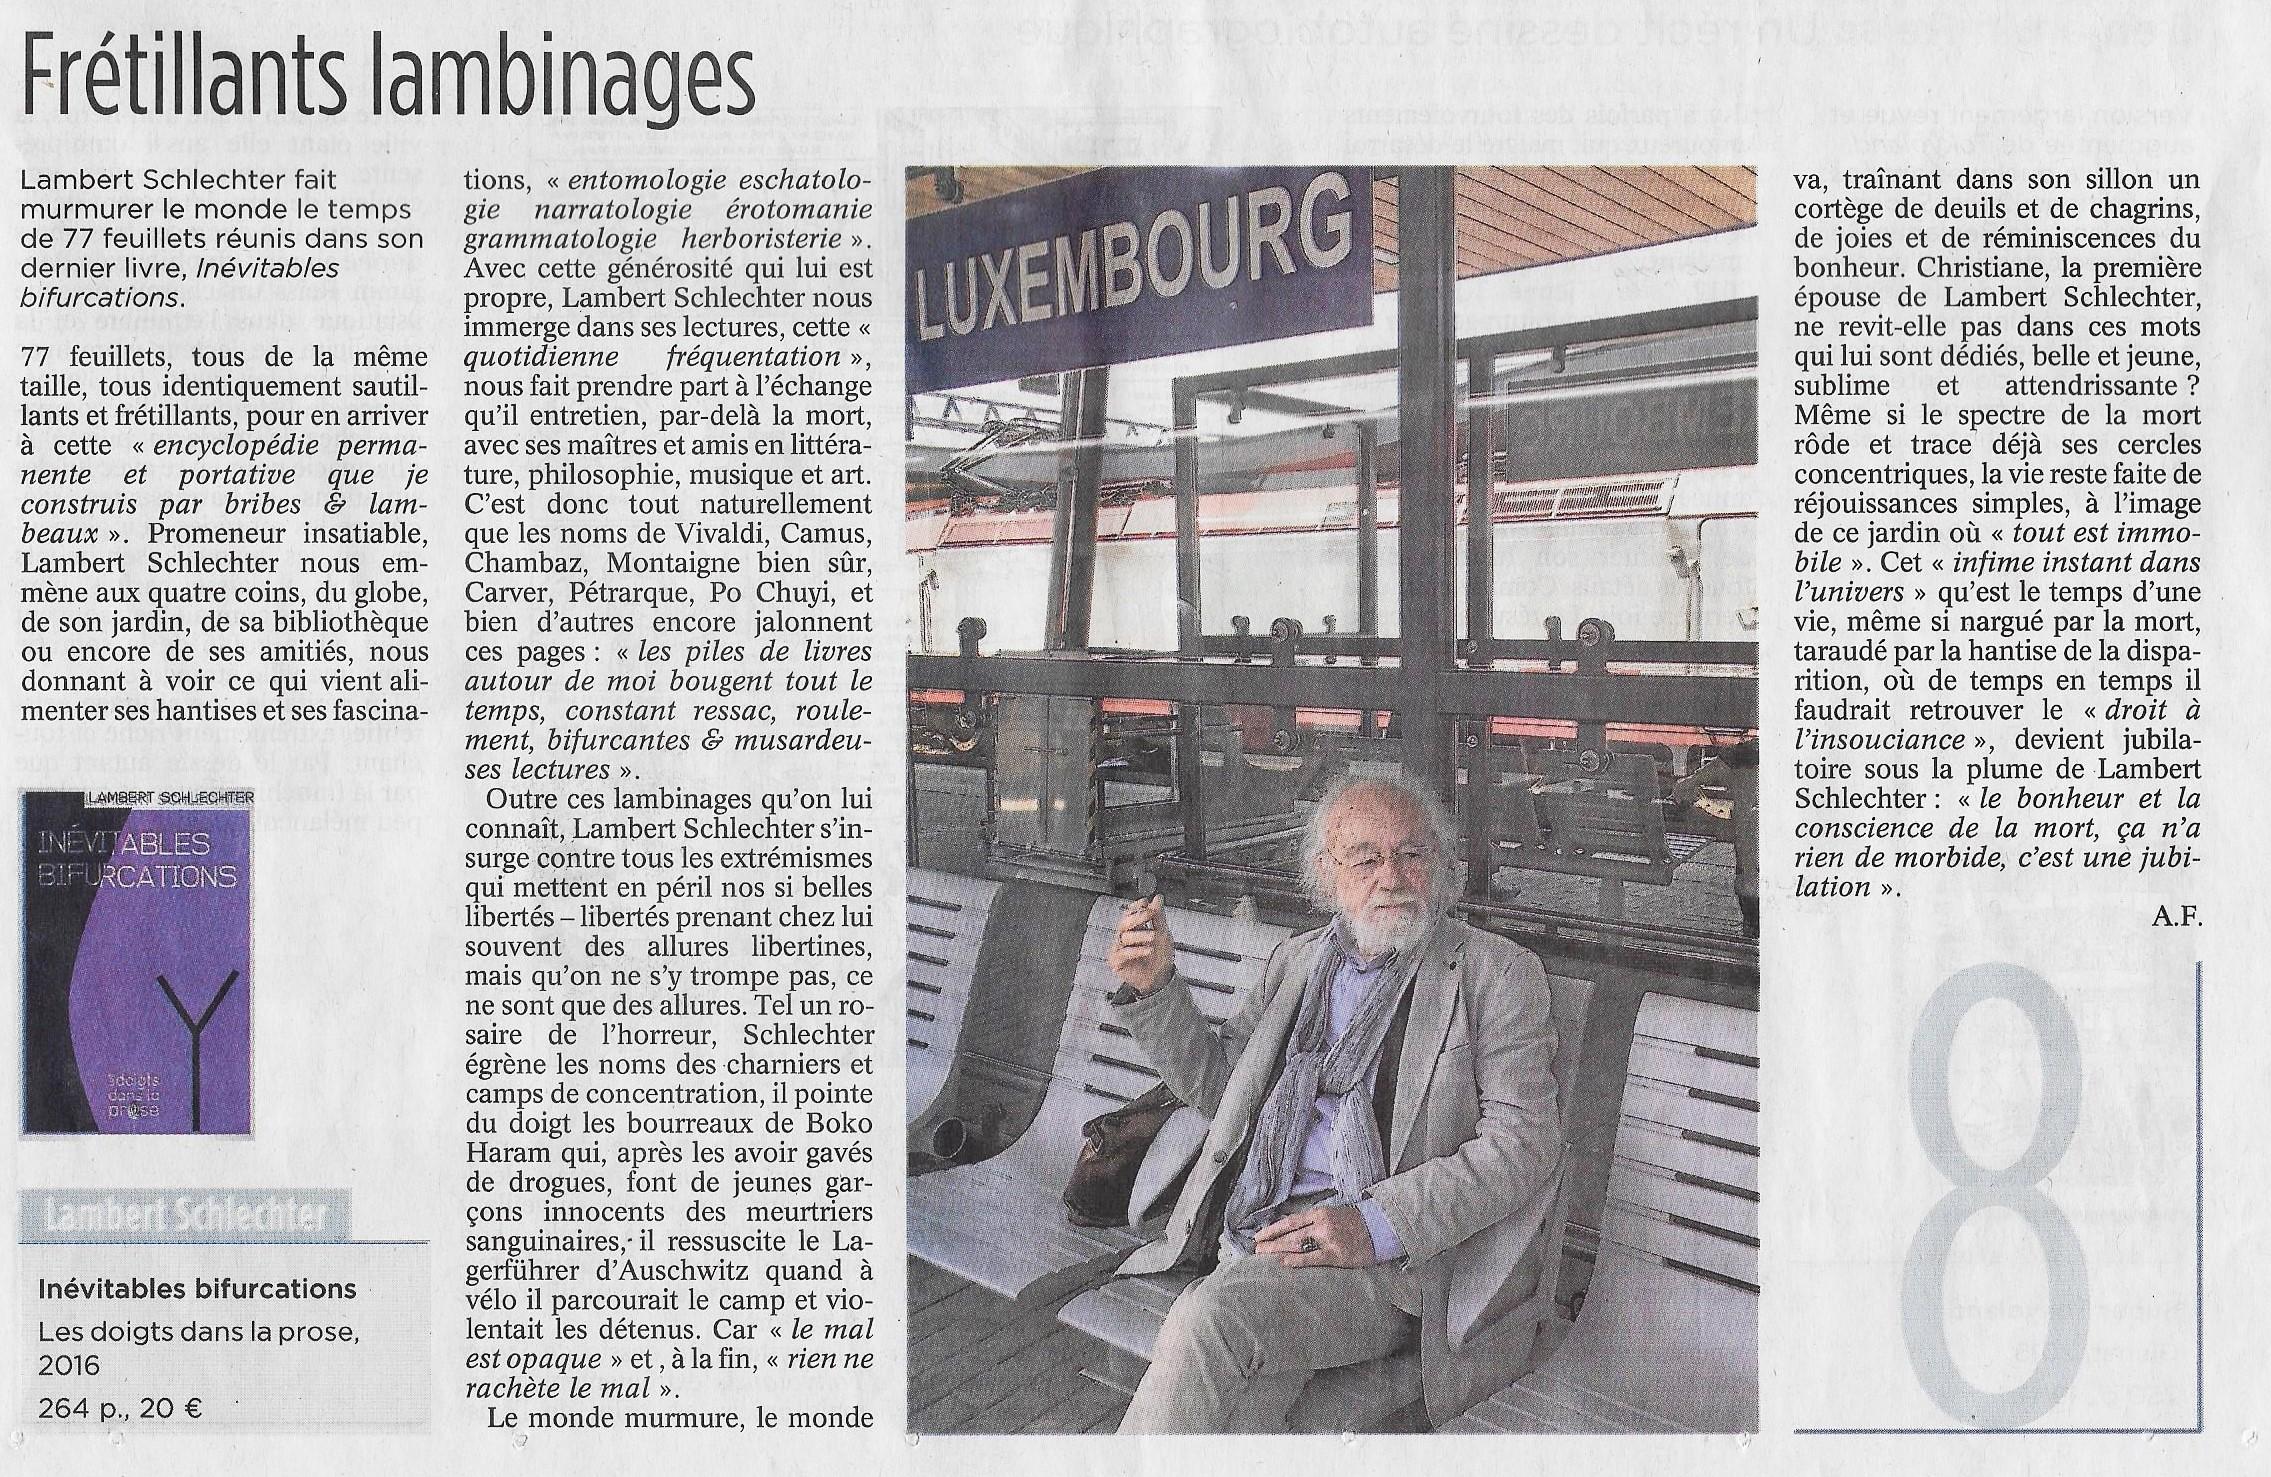 Bücher_Inévitables bifurcations dans la presse luxembourgeoise_juillet2016